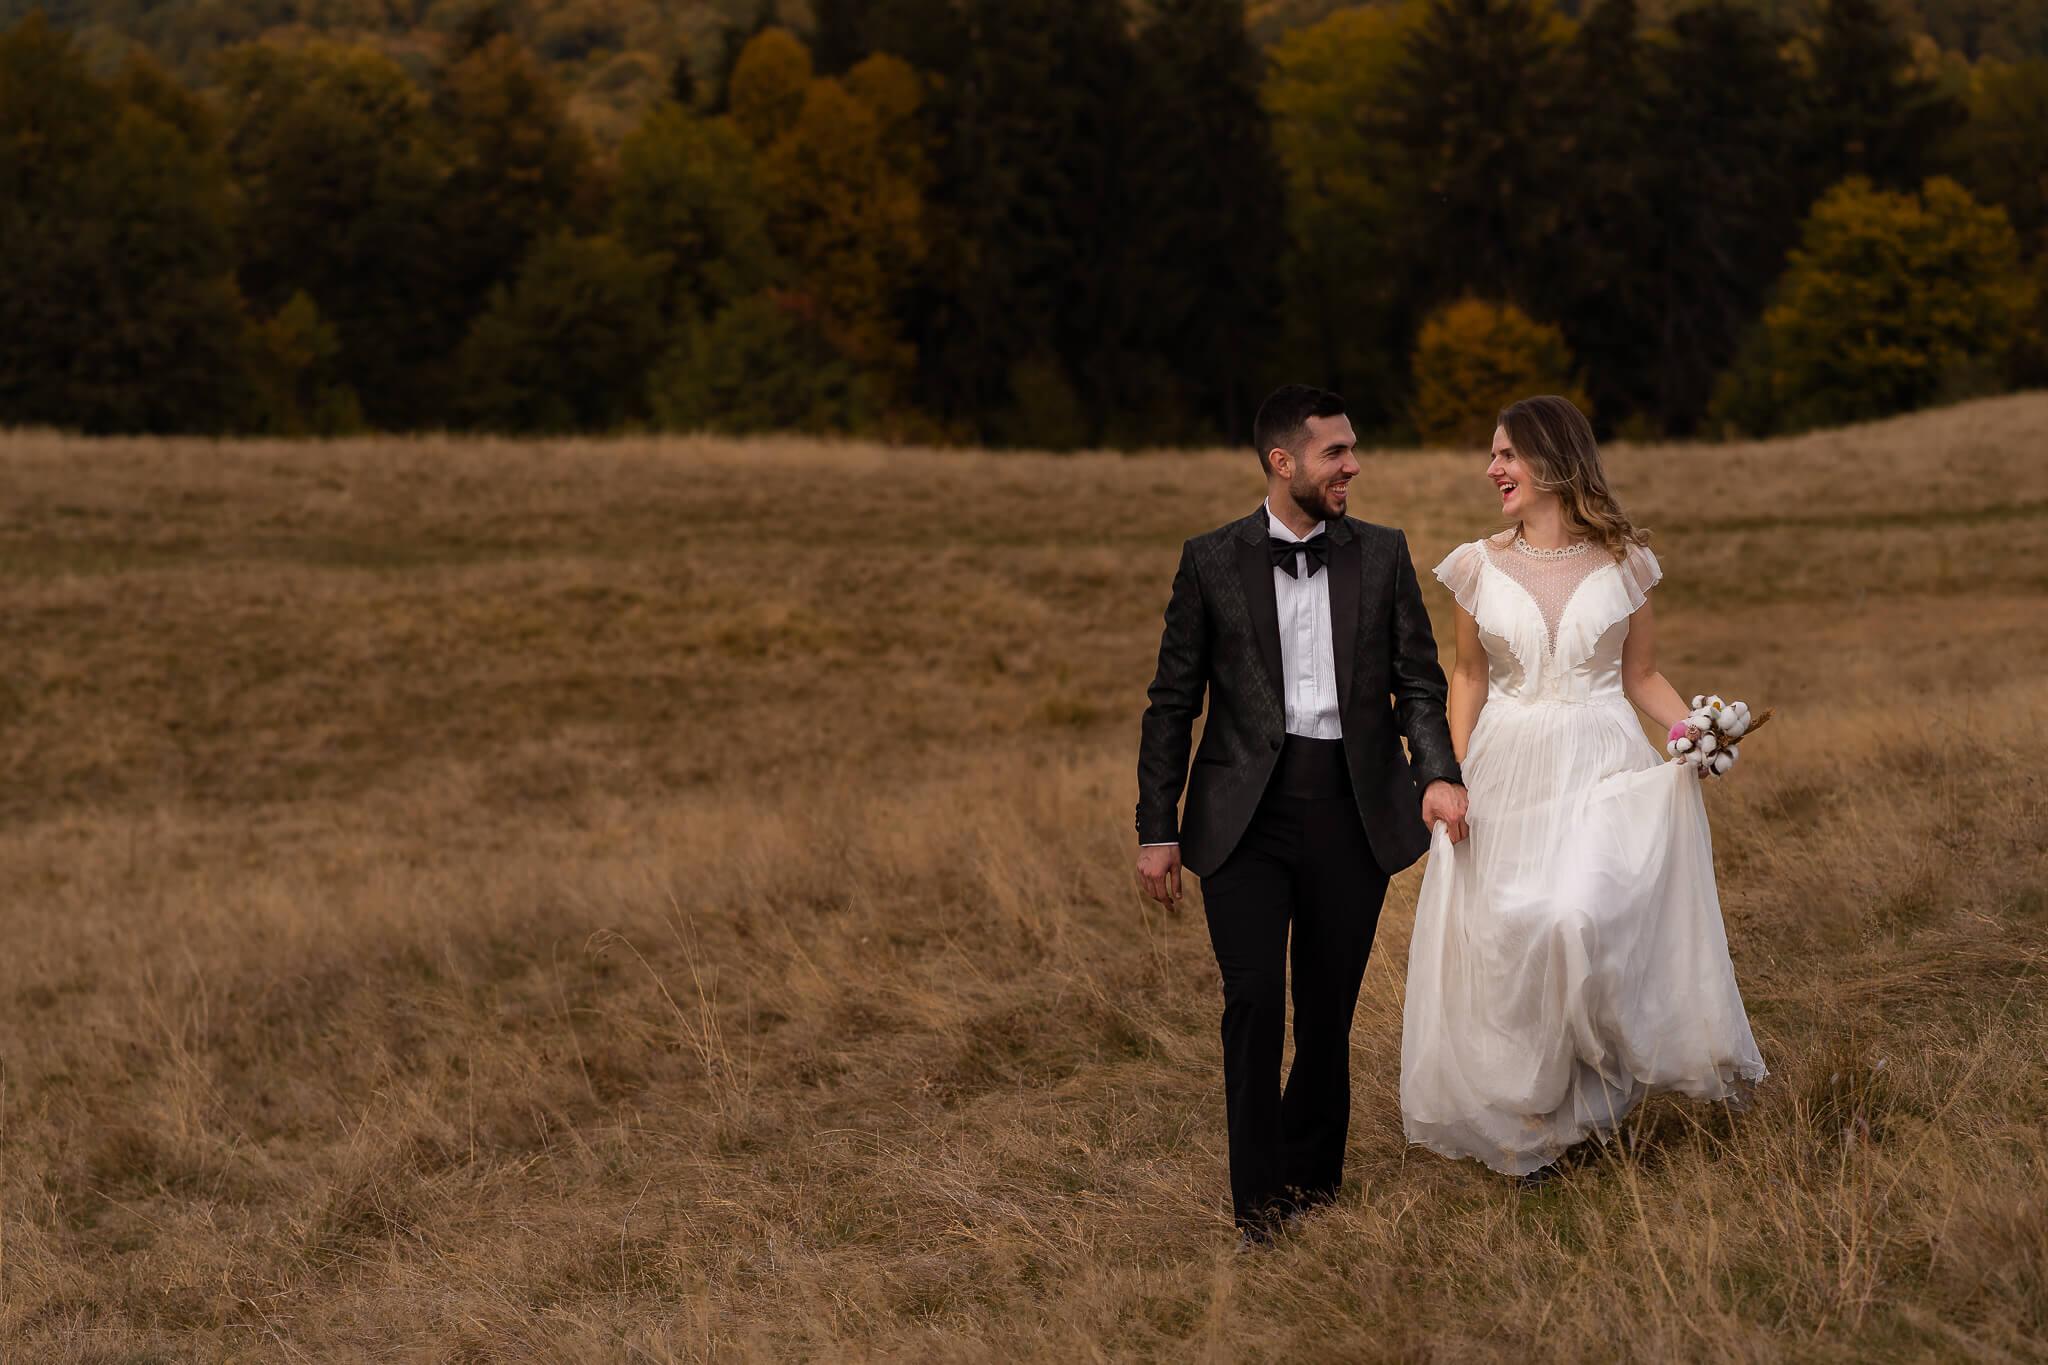 Fotografie de nunta in Bucuresti